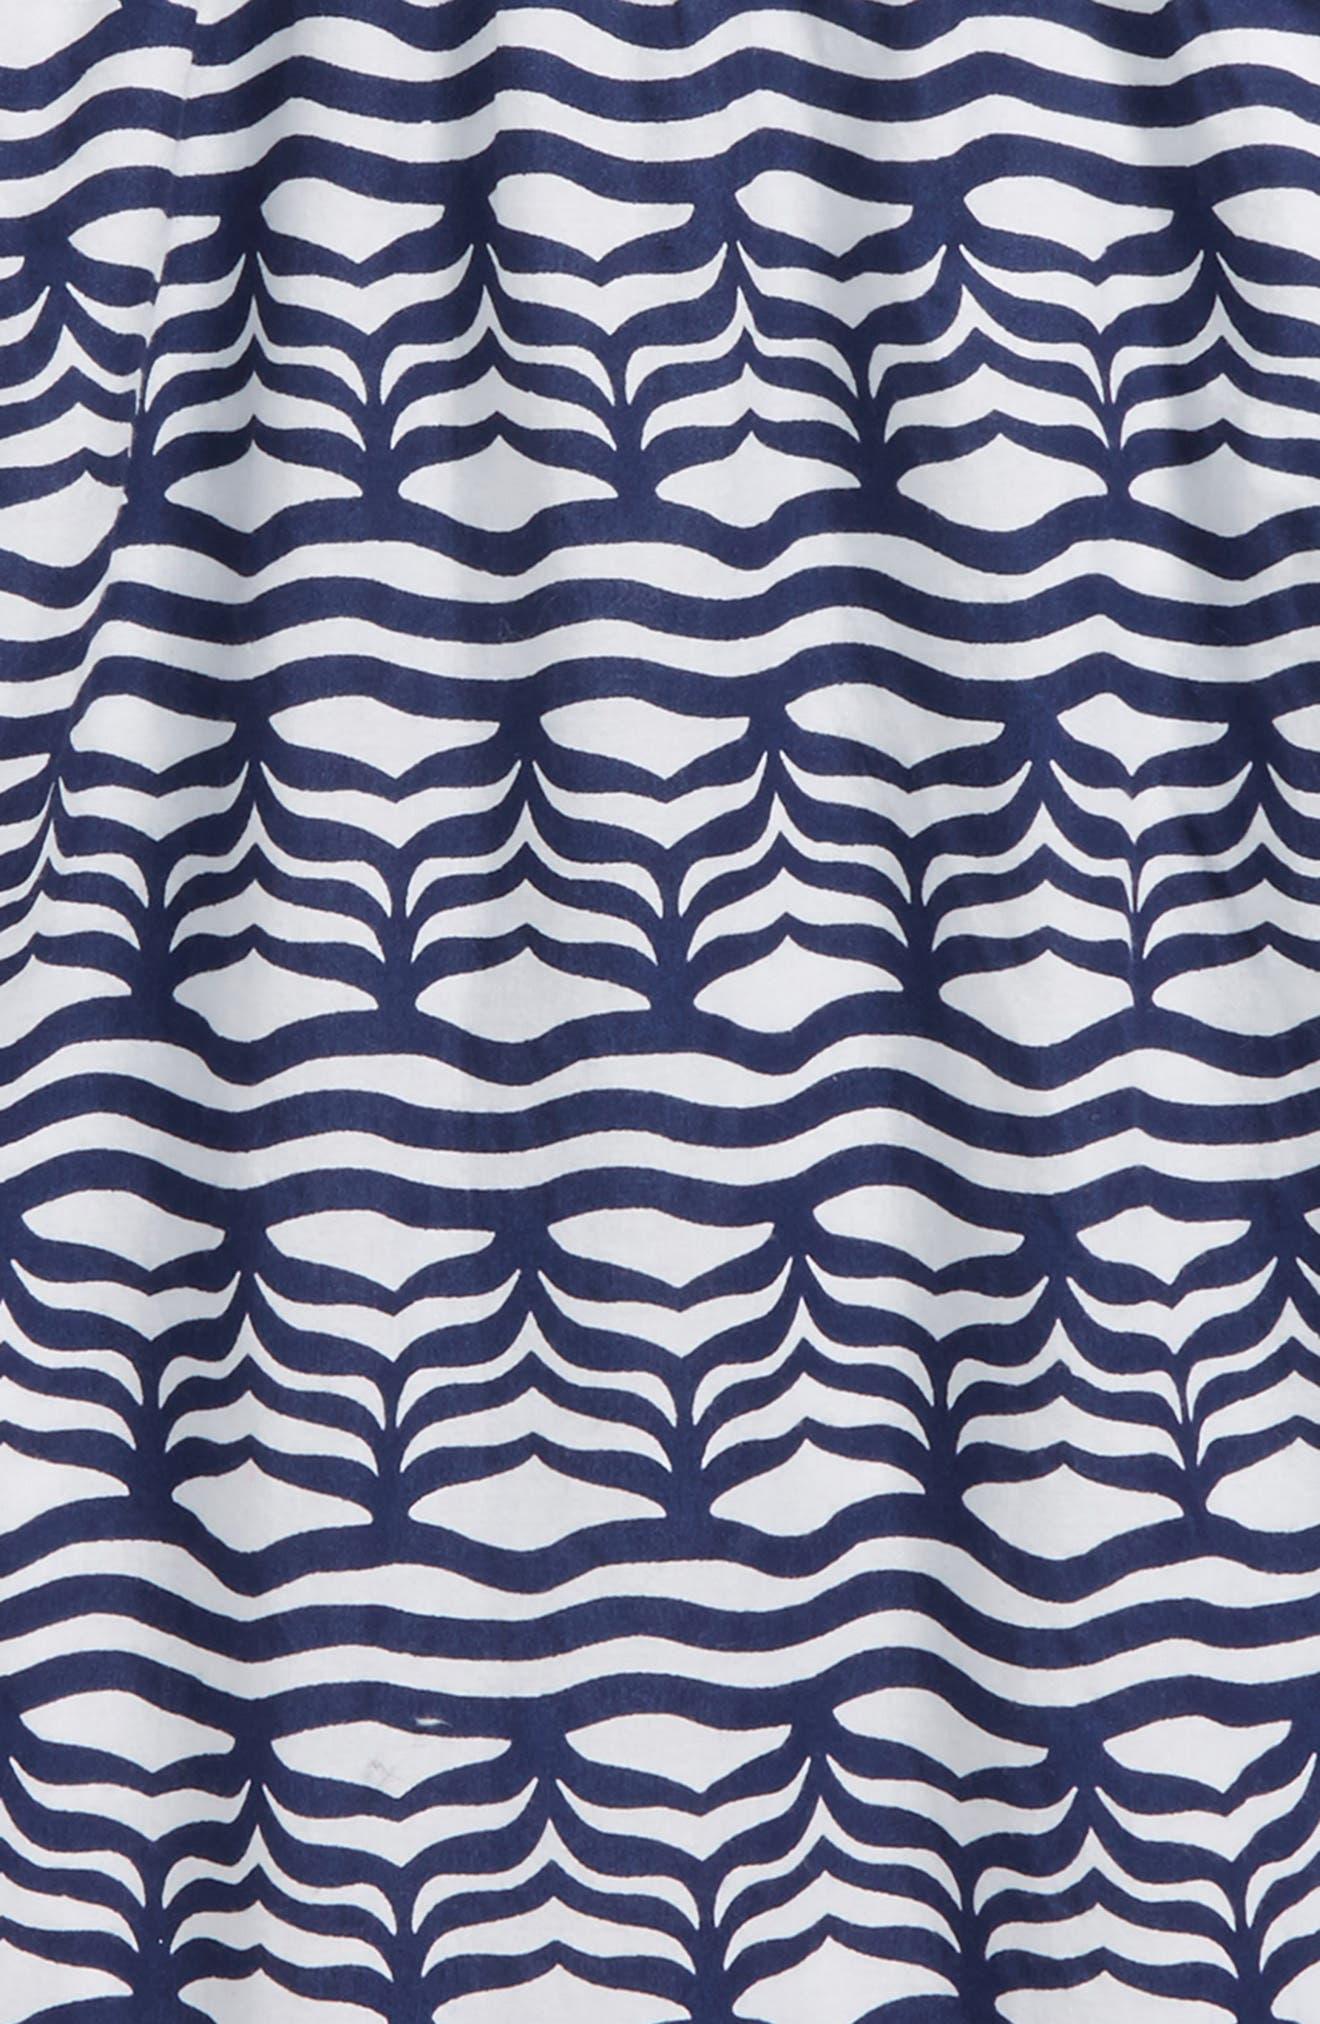 Whale Tail Wave Dress,                             Alternate thumbnail 3, color,                             Deep Bay